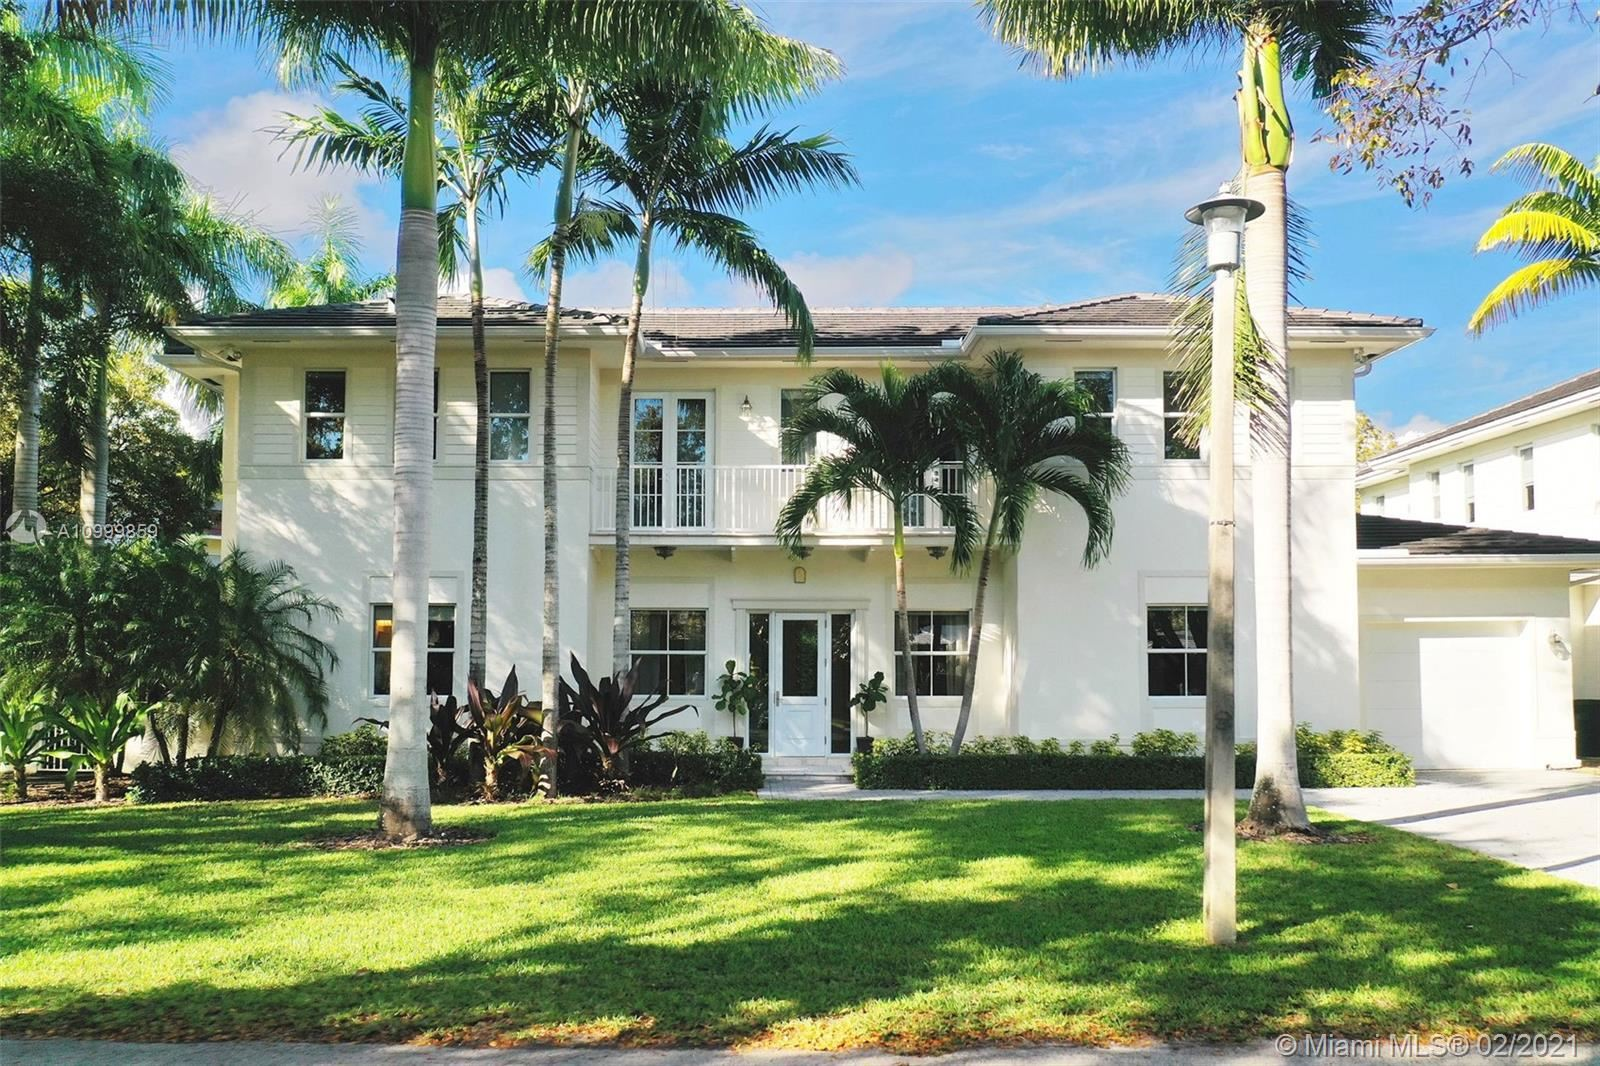 1133 Cotorro Ave, Coral Gables, FL 33146 - #: A10999859